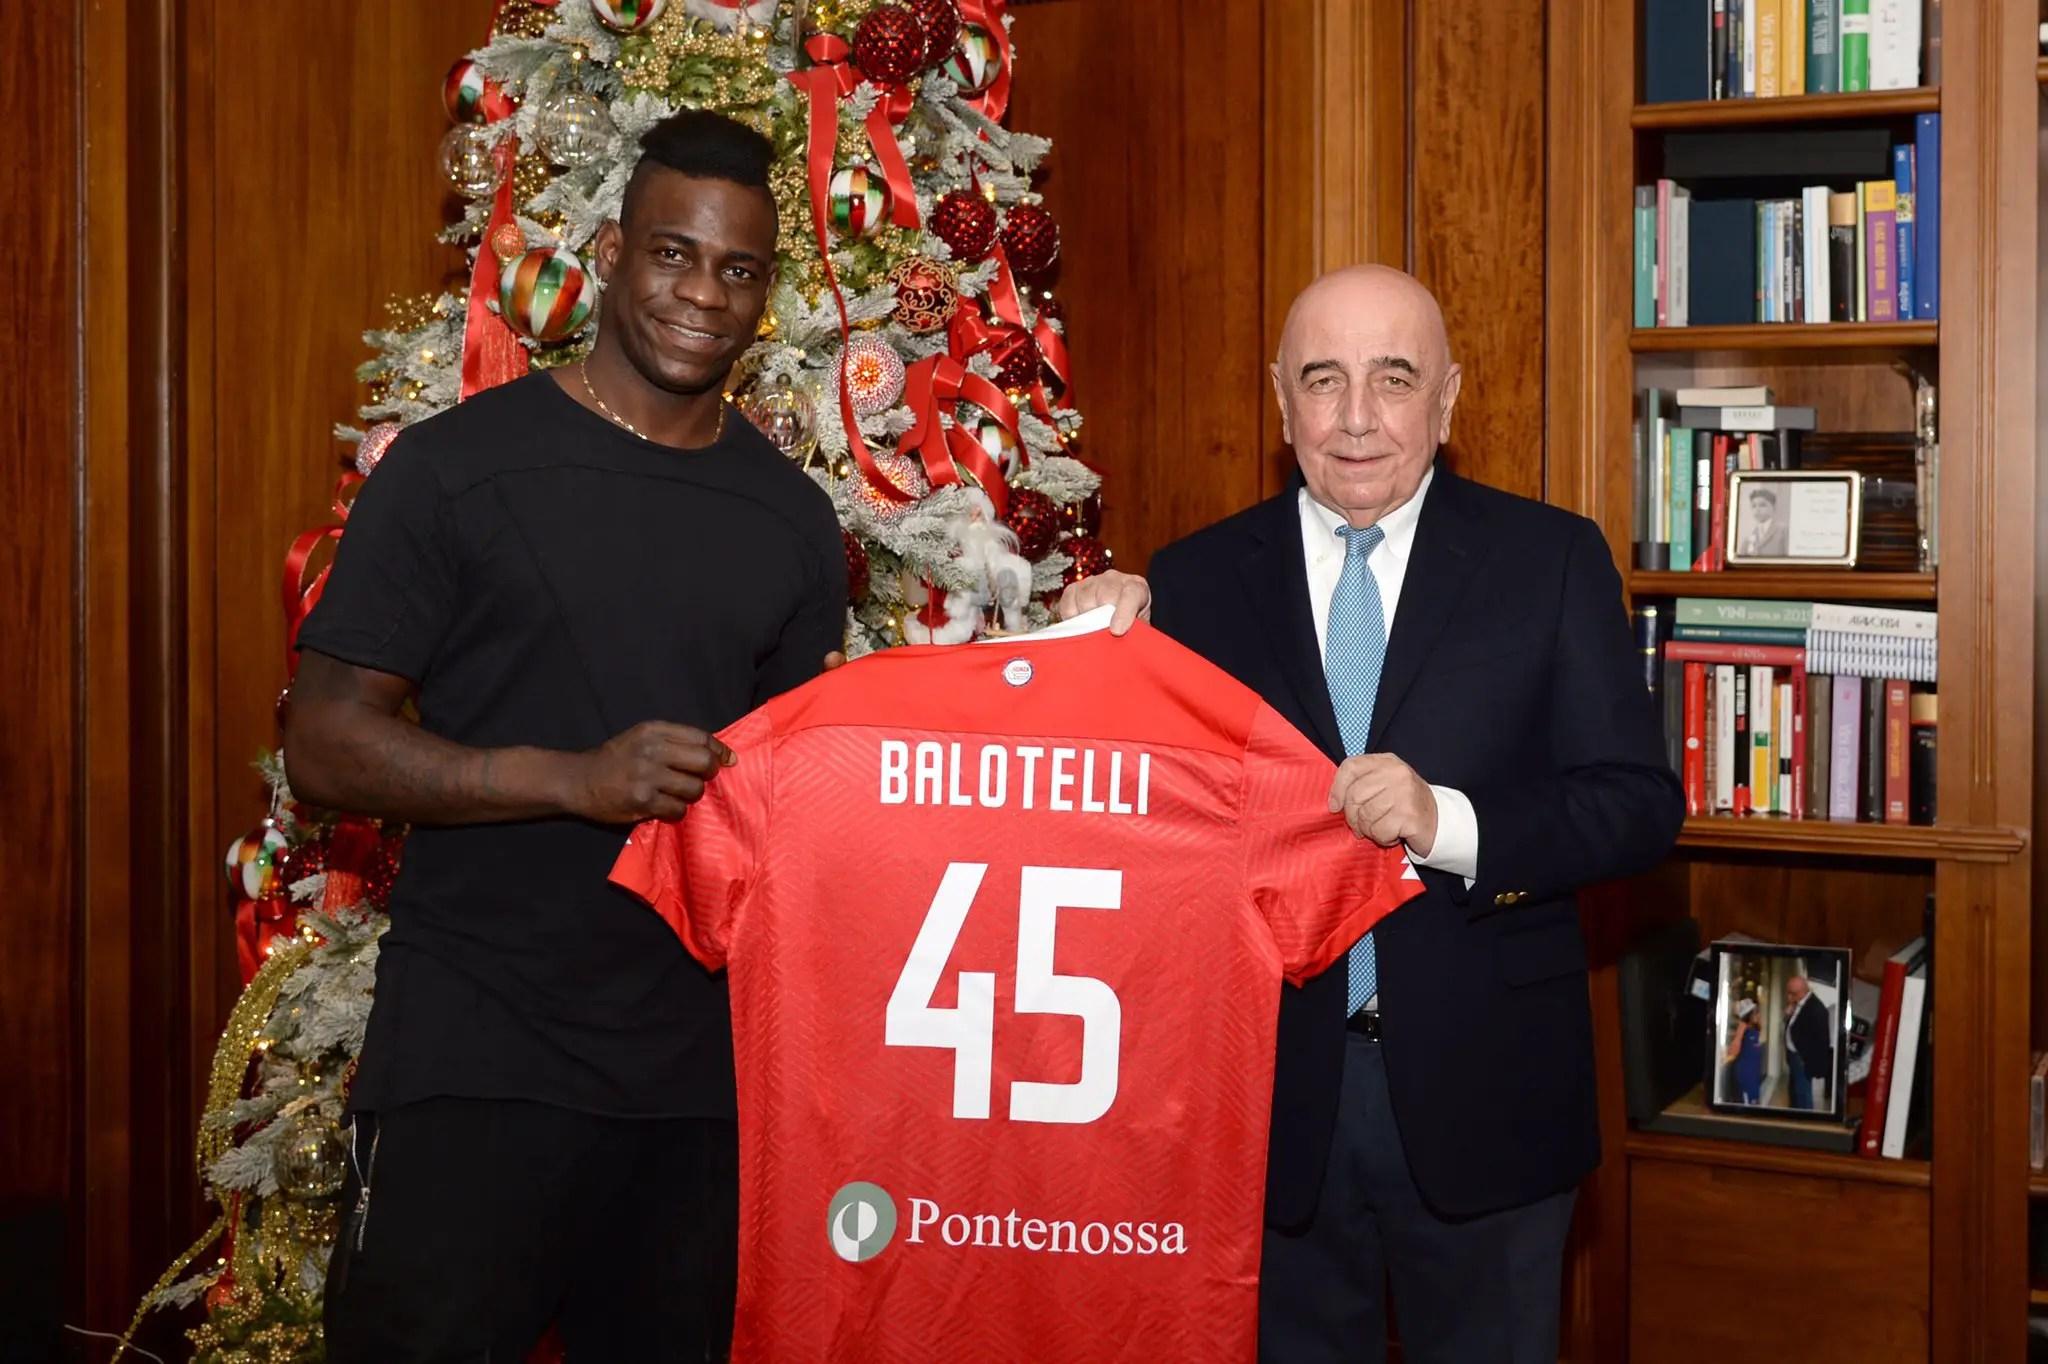 Balotelli joins Serie B Club AC Monza